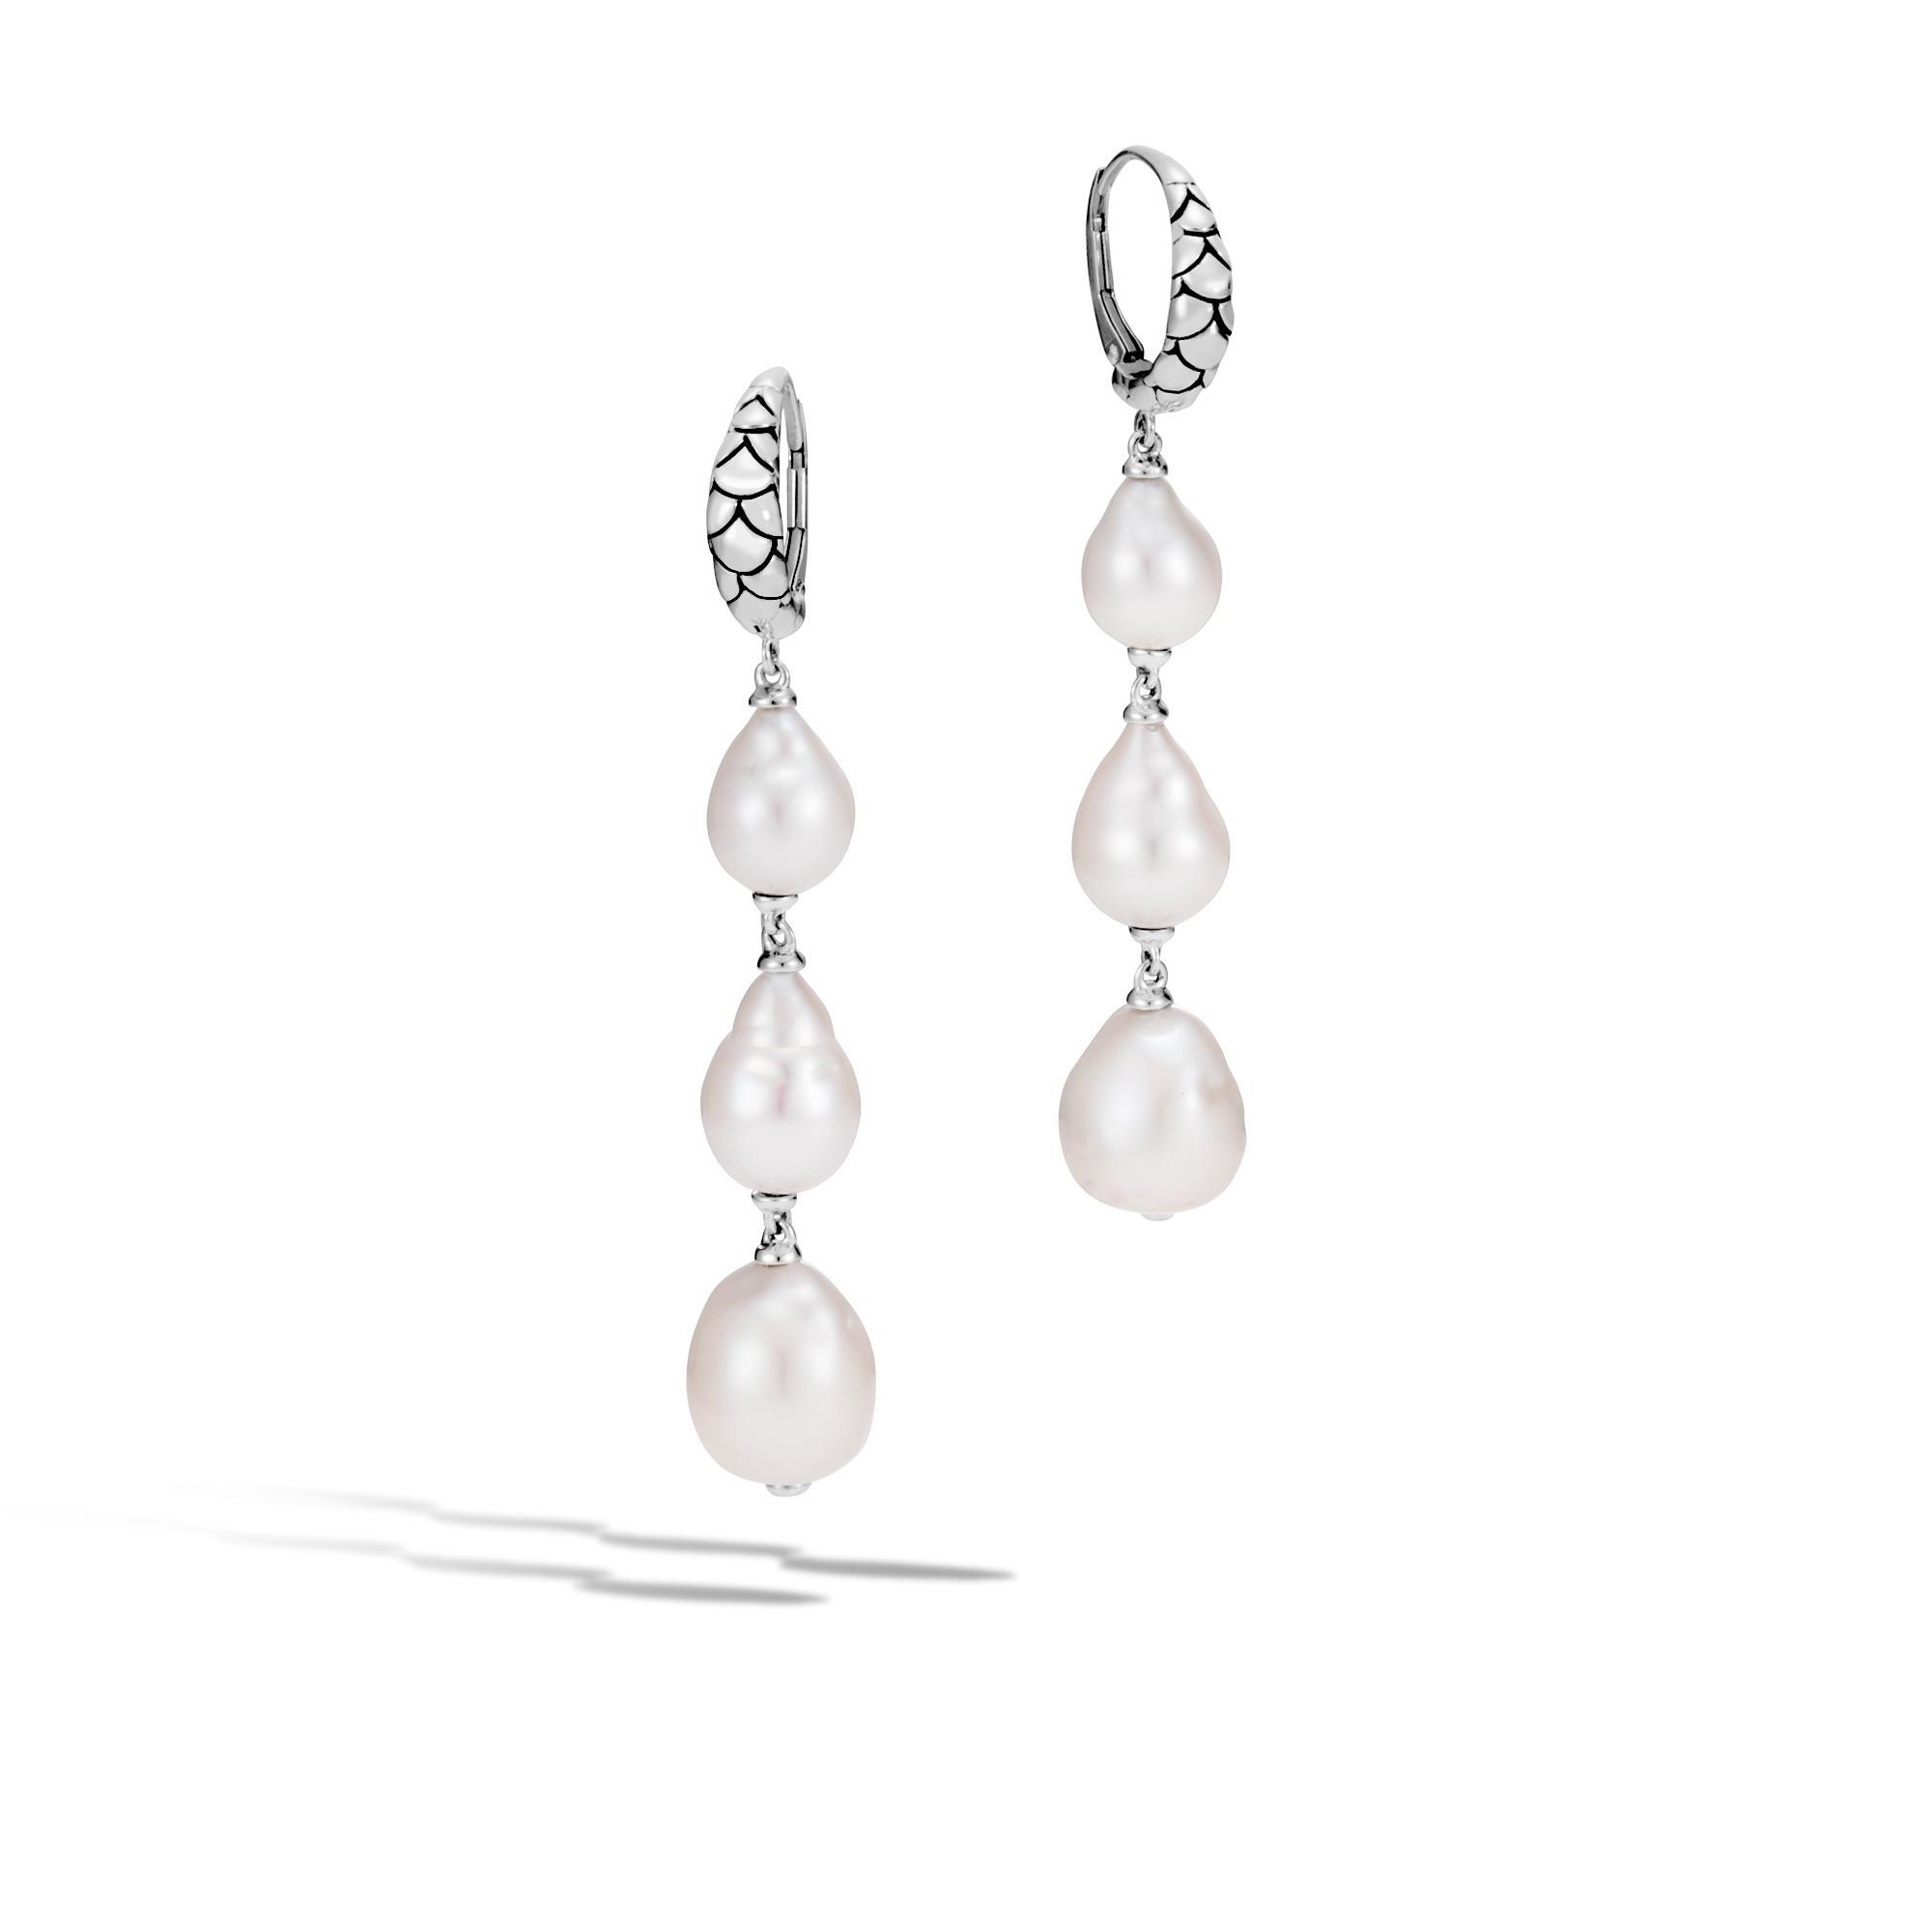 John Hardy Naga Drop Earring With Pearl White fresh water pearl 3tD20